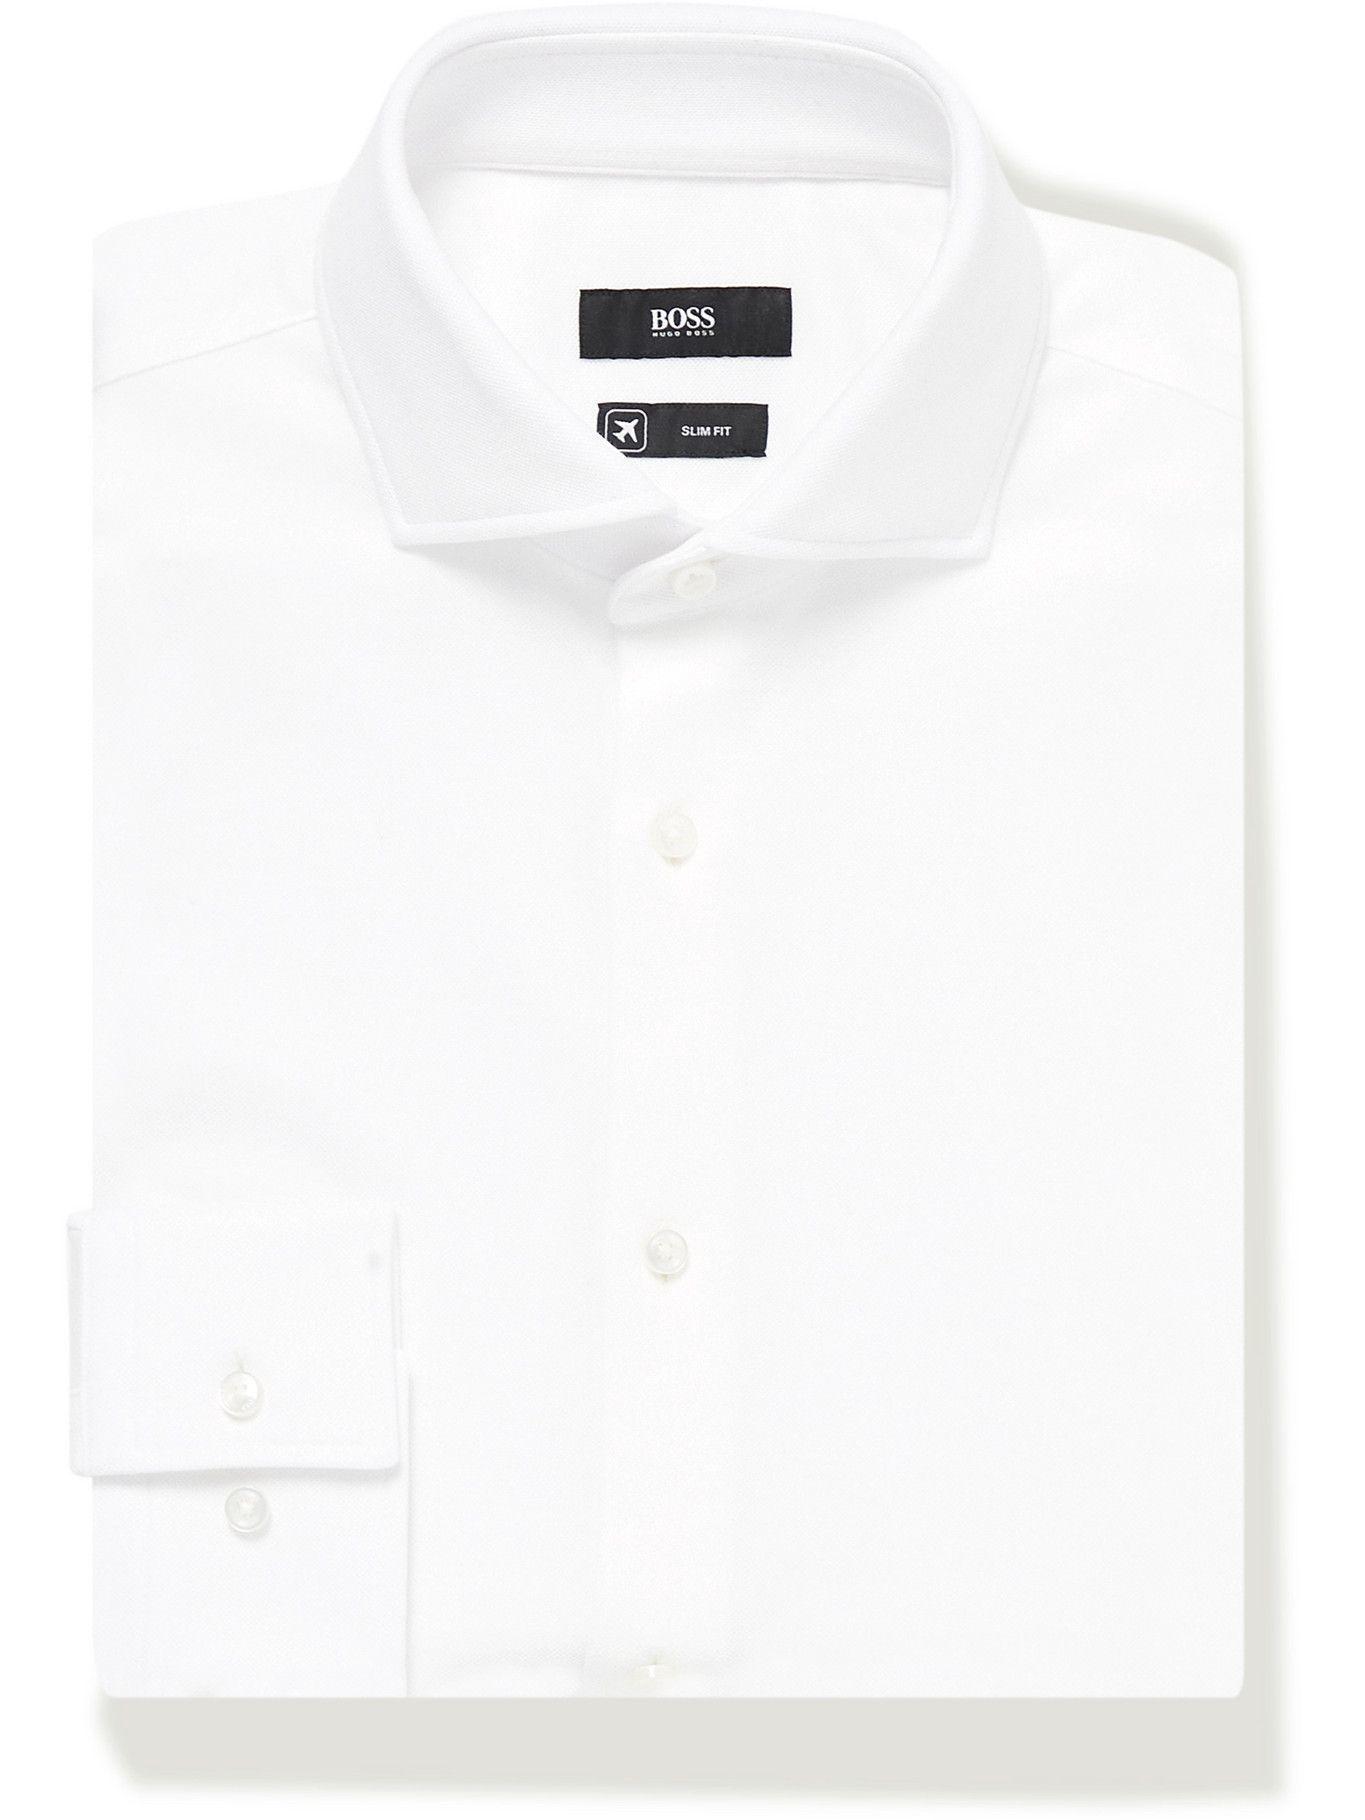 HUGO BOSS - Slim-Fit Textured-Cotton Jersey Shirt - White